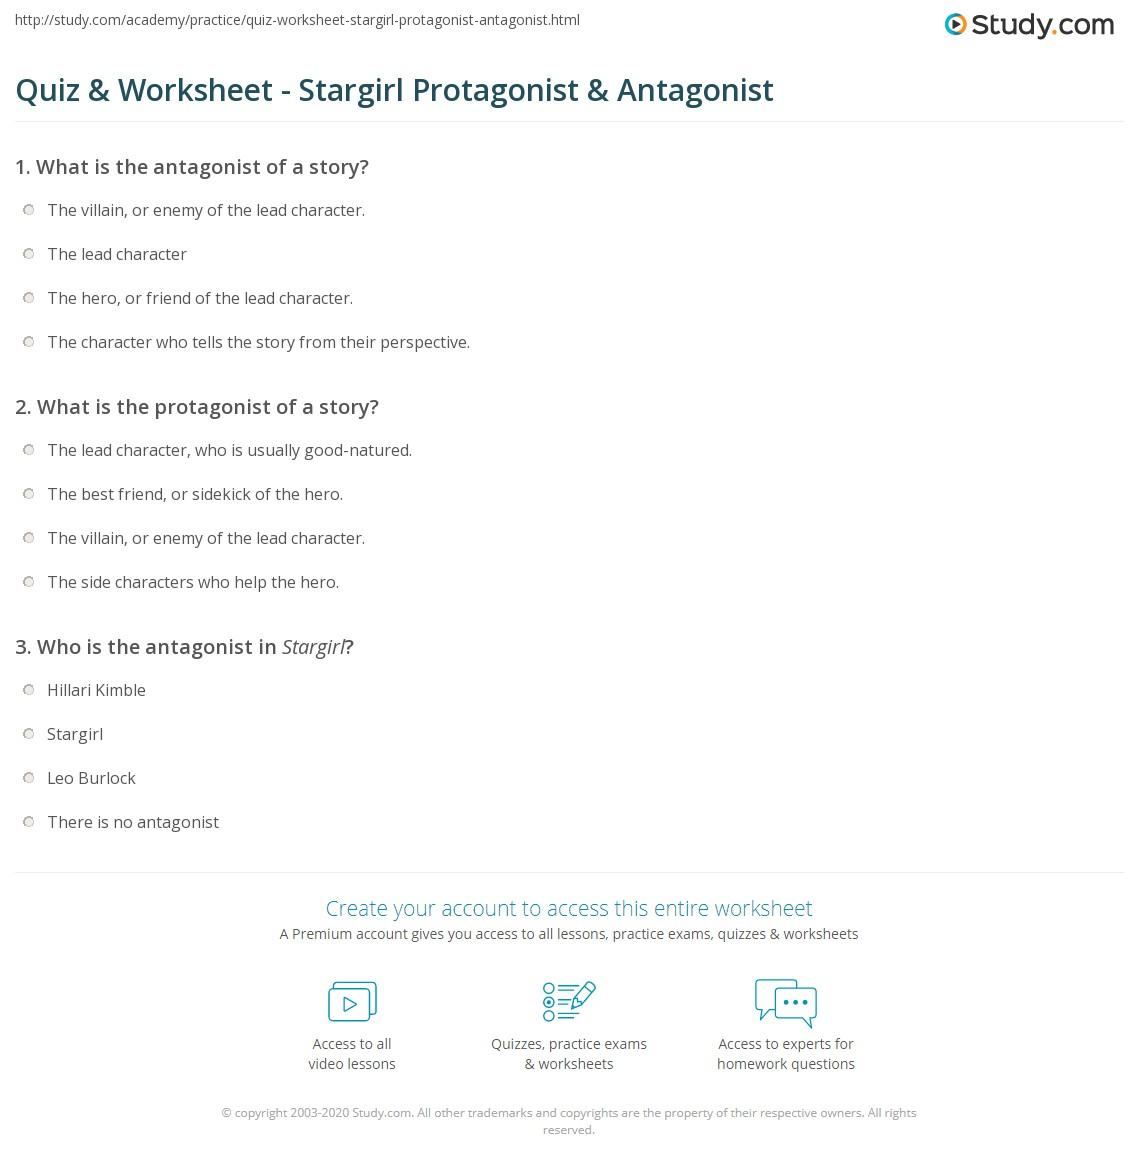 Quiz Worksheet Stargirl Protagonist Antagonist Study